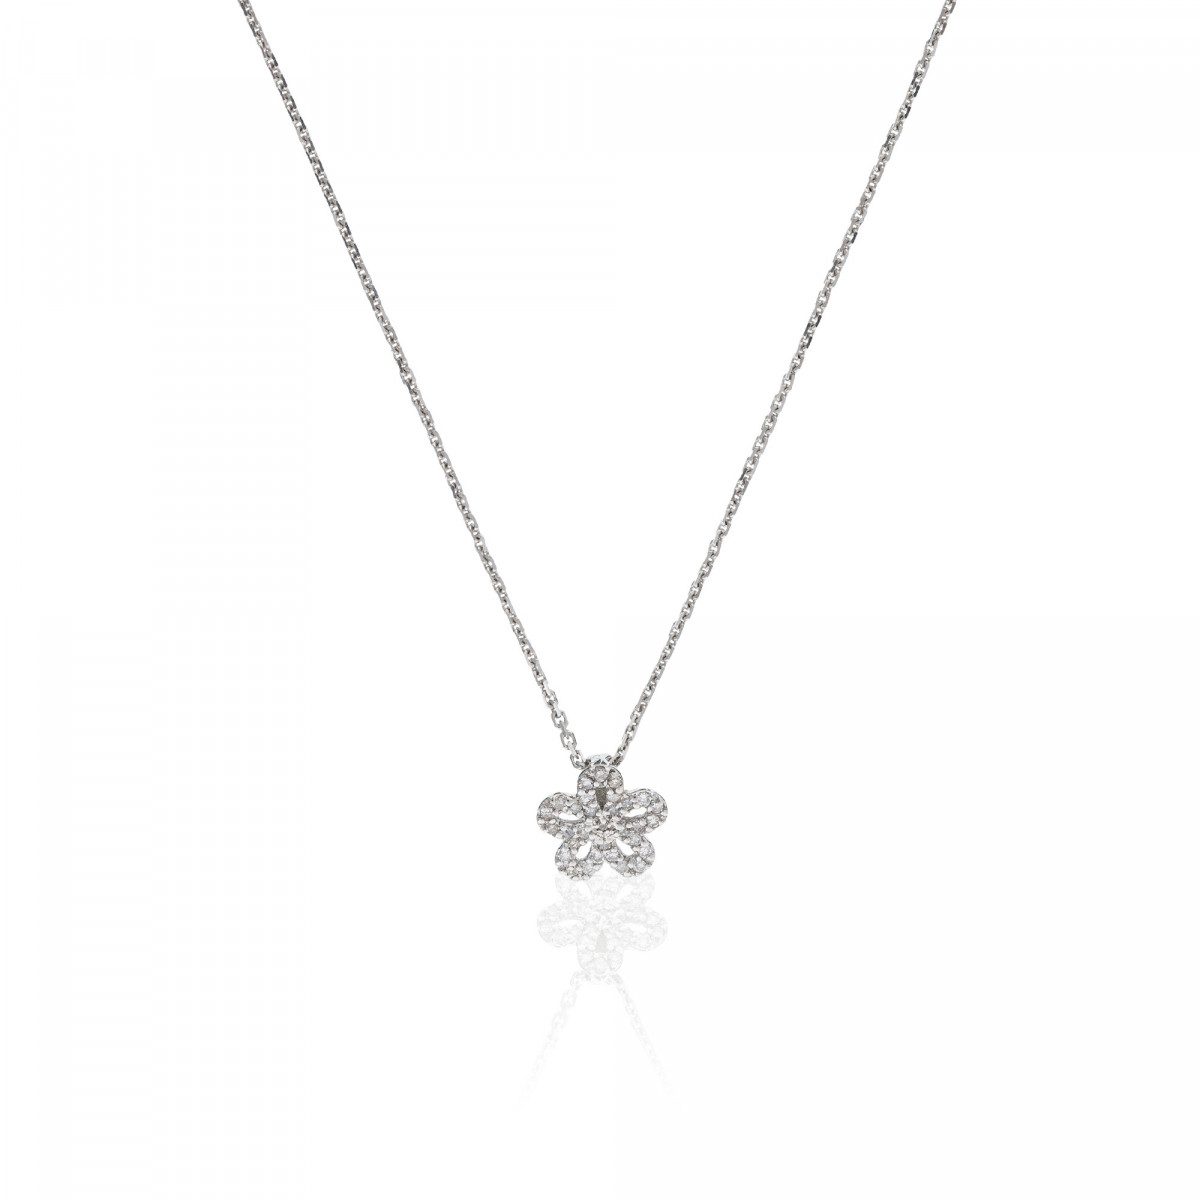 "Pendentif Or Blanc ""LILLY"" Diamants 0,09 carat + chaine argent offerte"